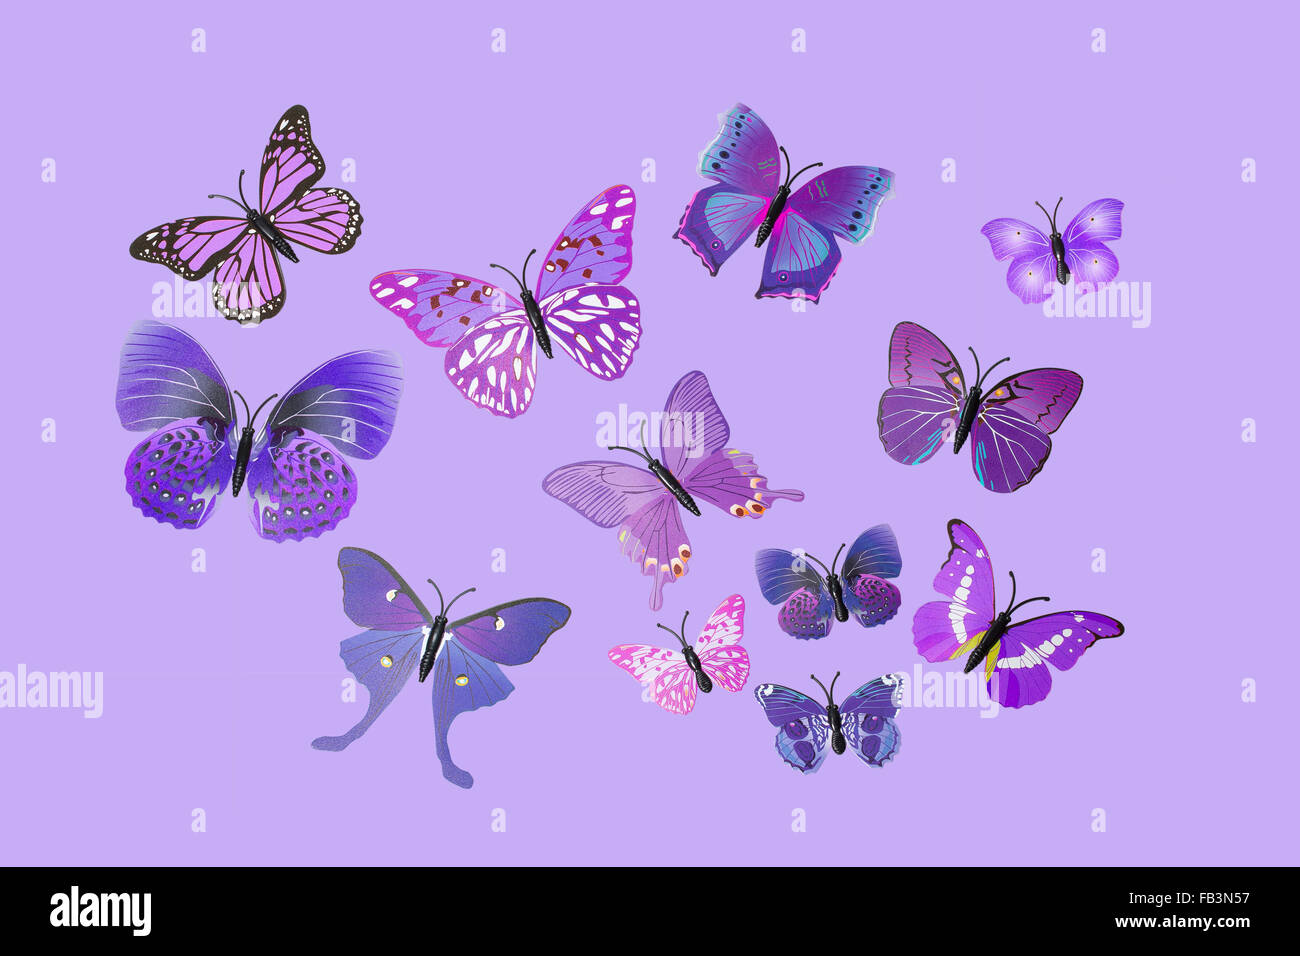 Collection de papillons fantaisie Violet Clip Art Photo Stock